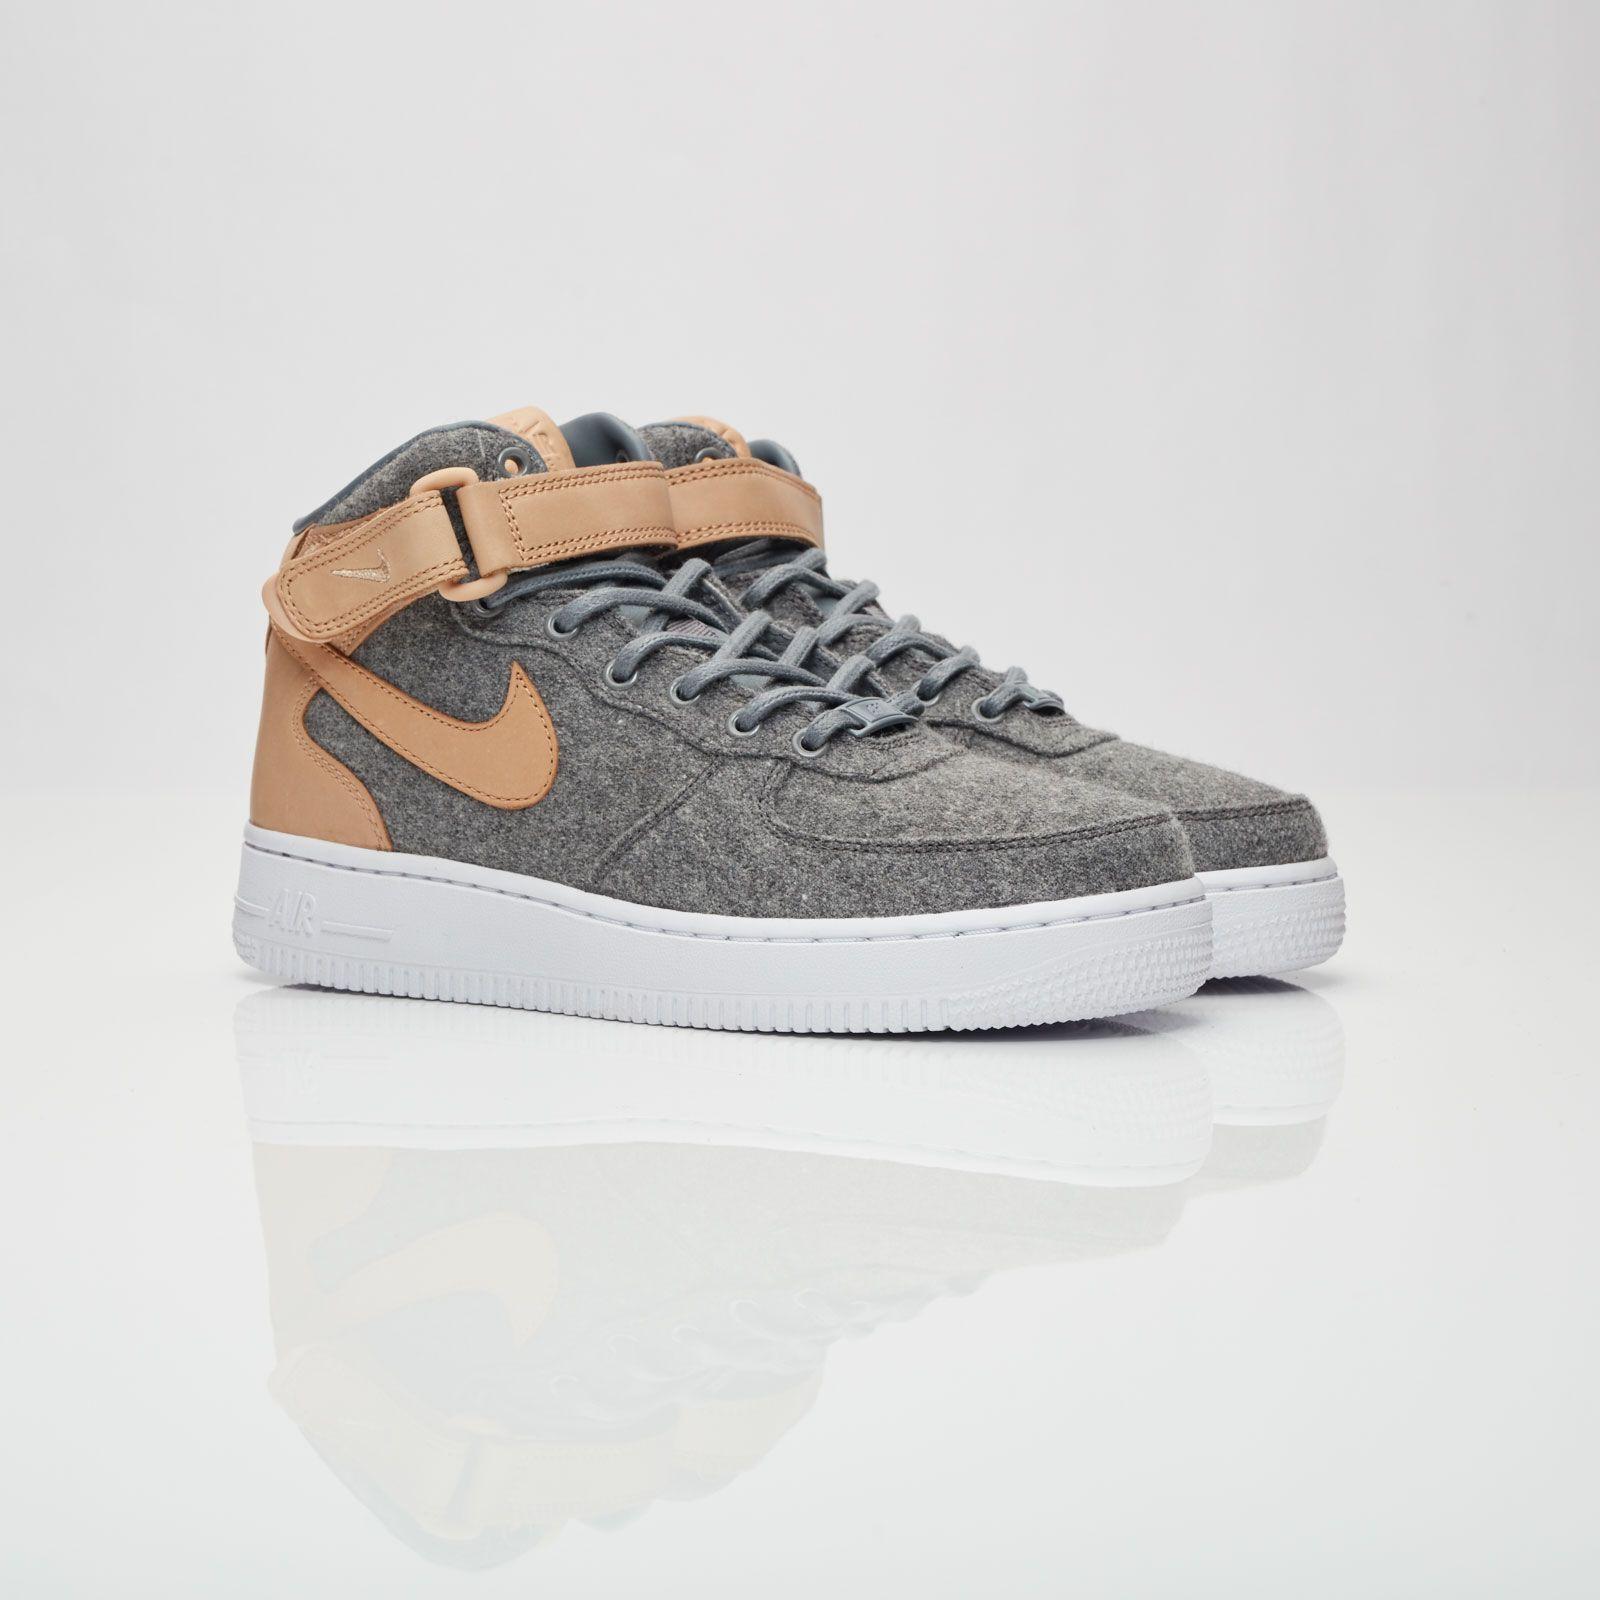 Nike Wmns Air Force 1 ´07 Mid Leather Premium | Nike | Nike